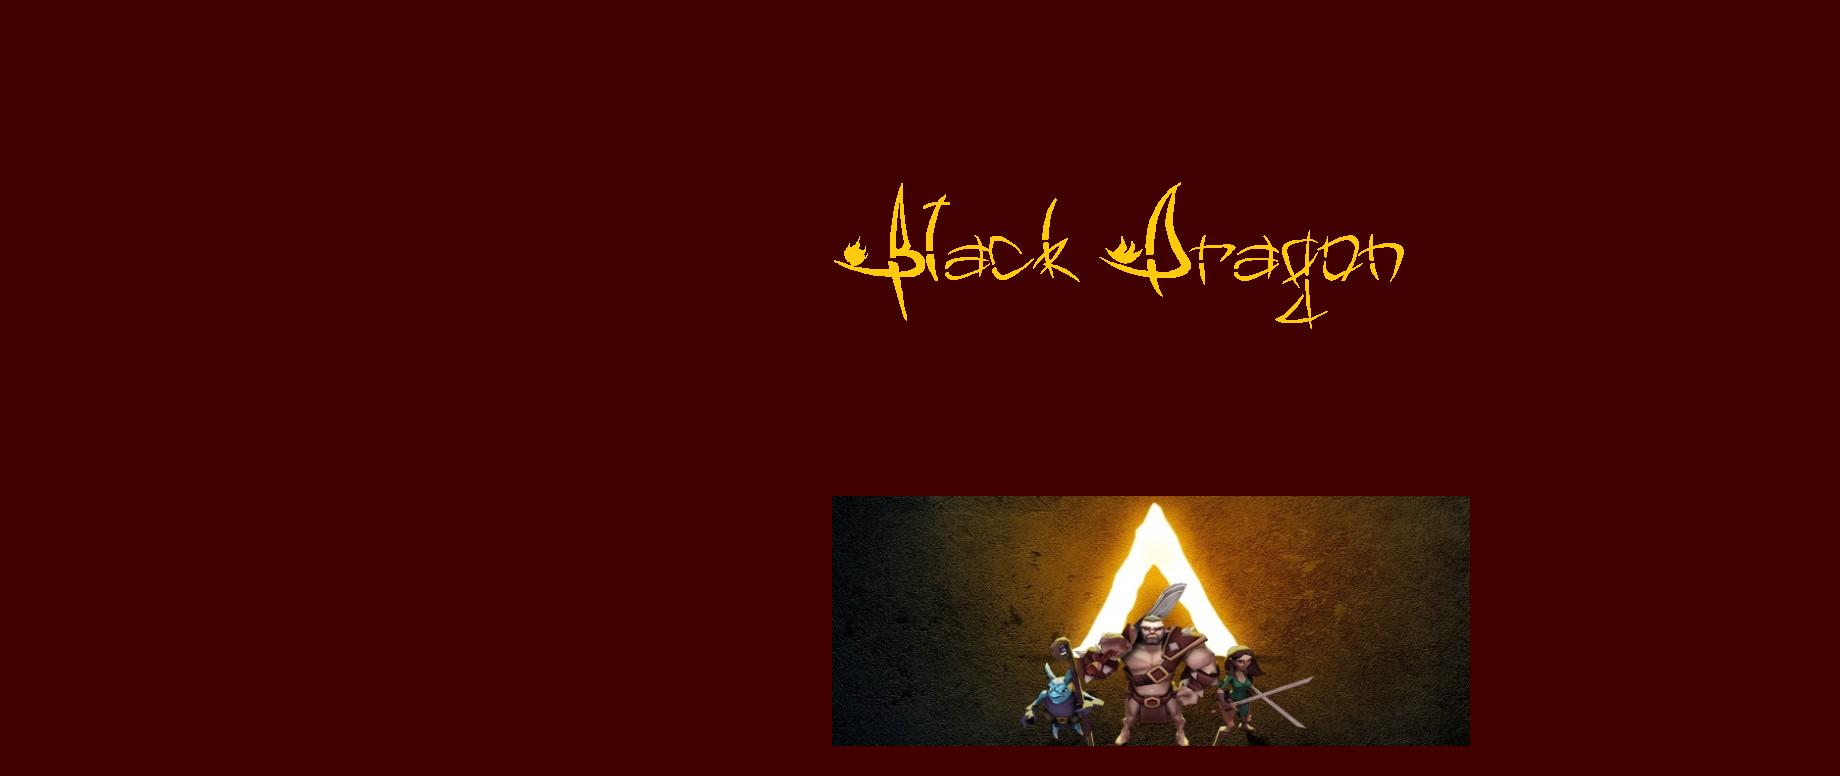 Name:  black dragon maroon logo.png Views: 1603 Size:  331.2 KB